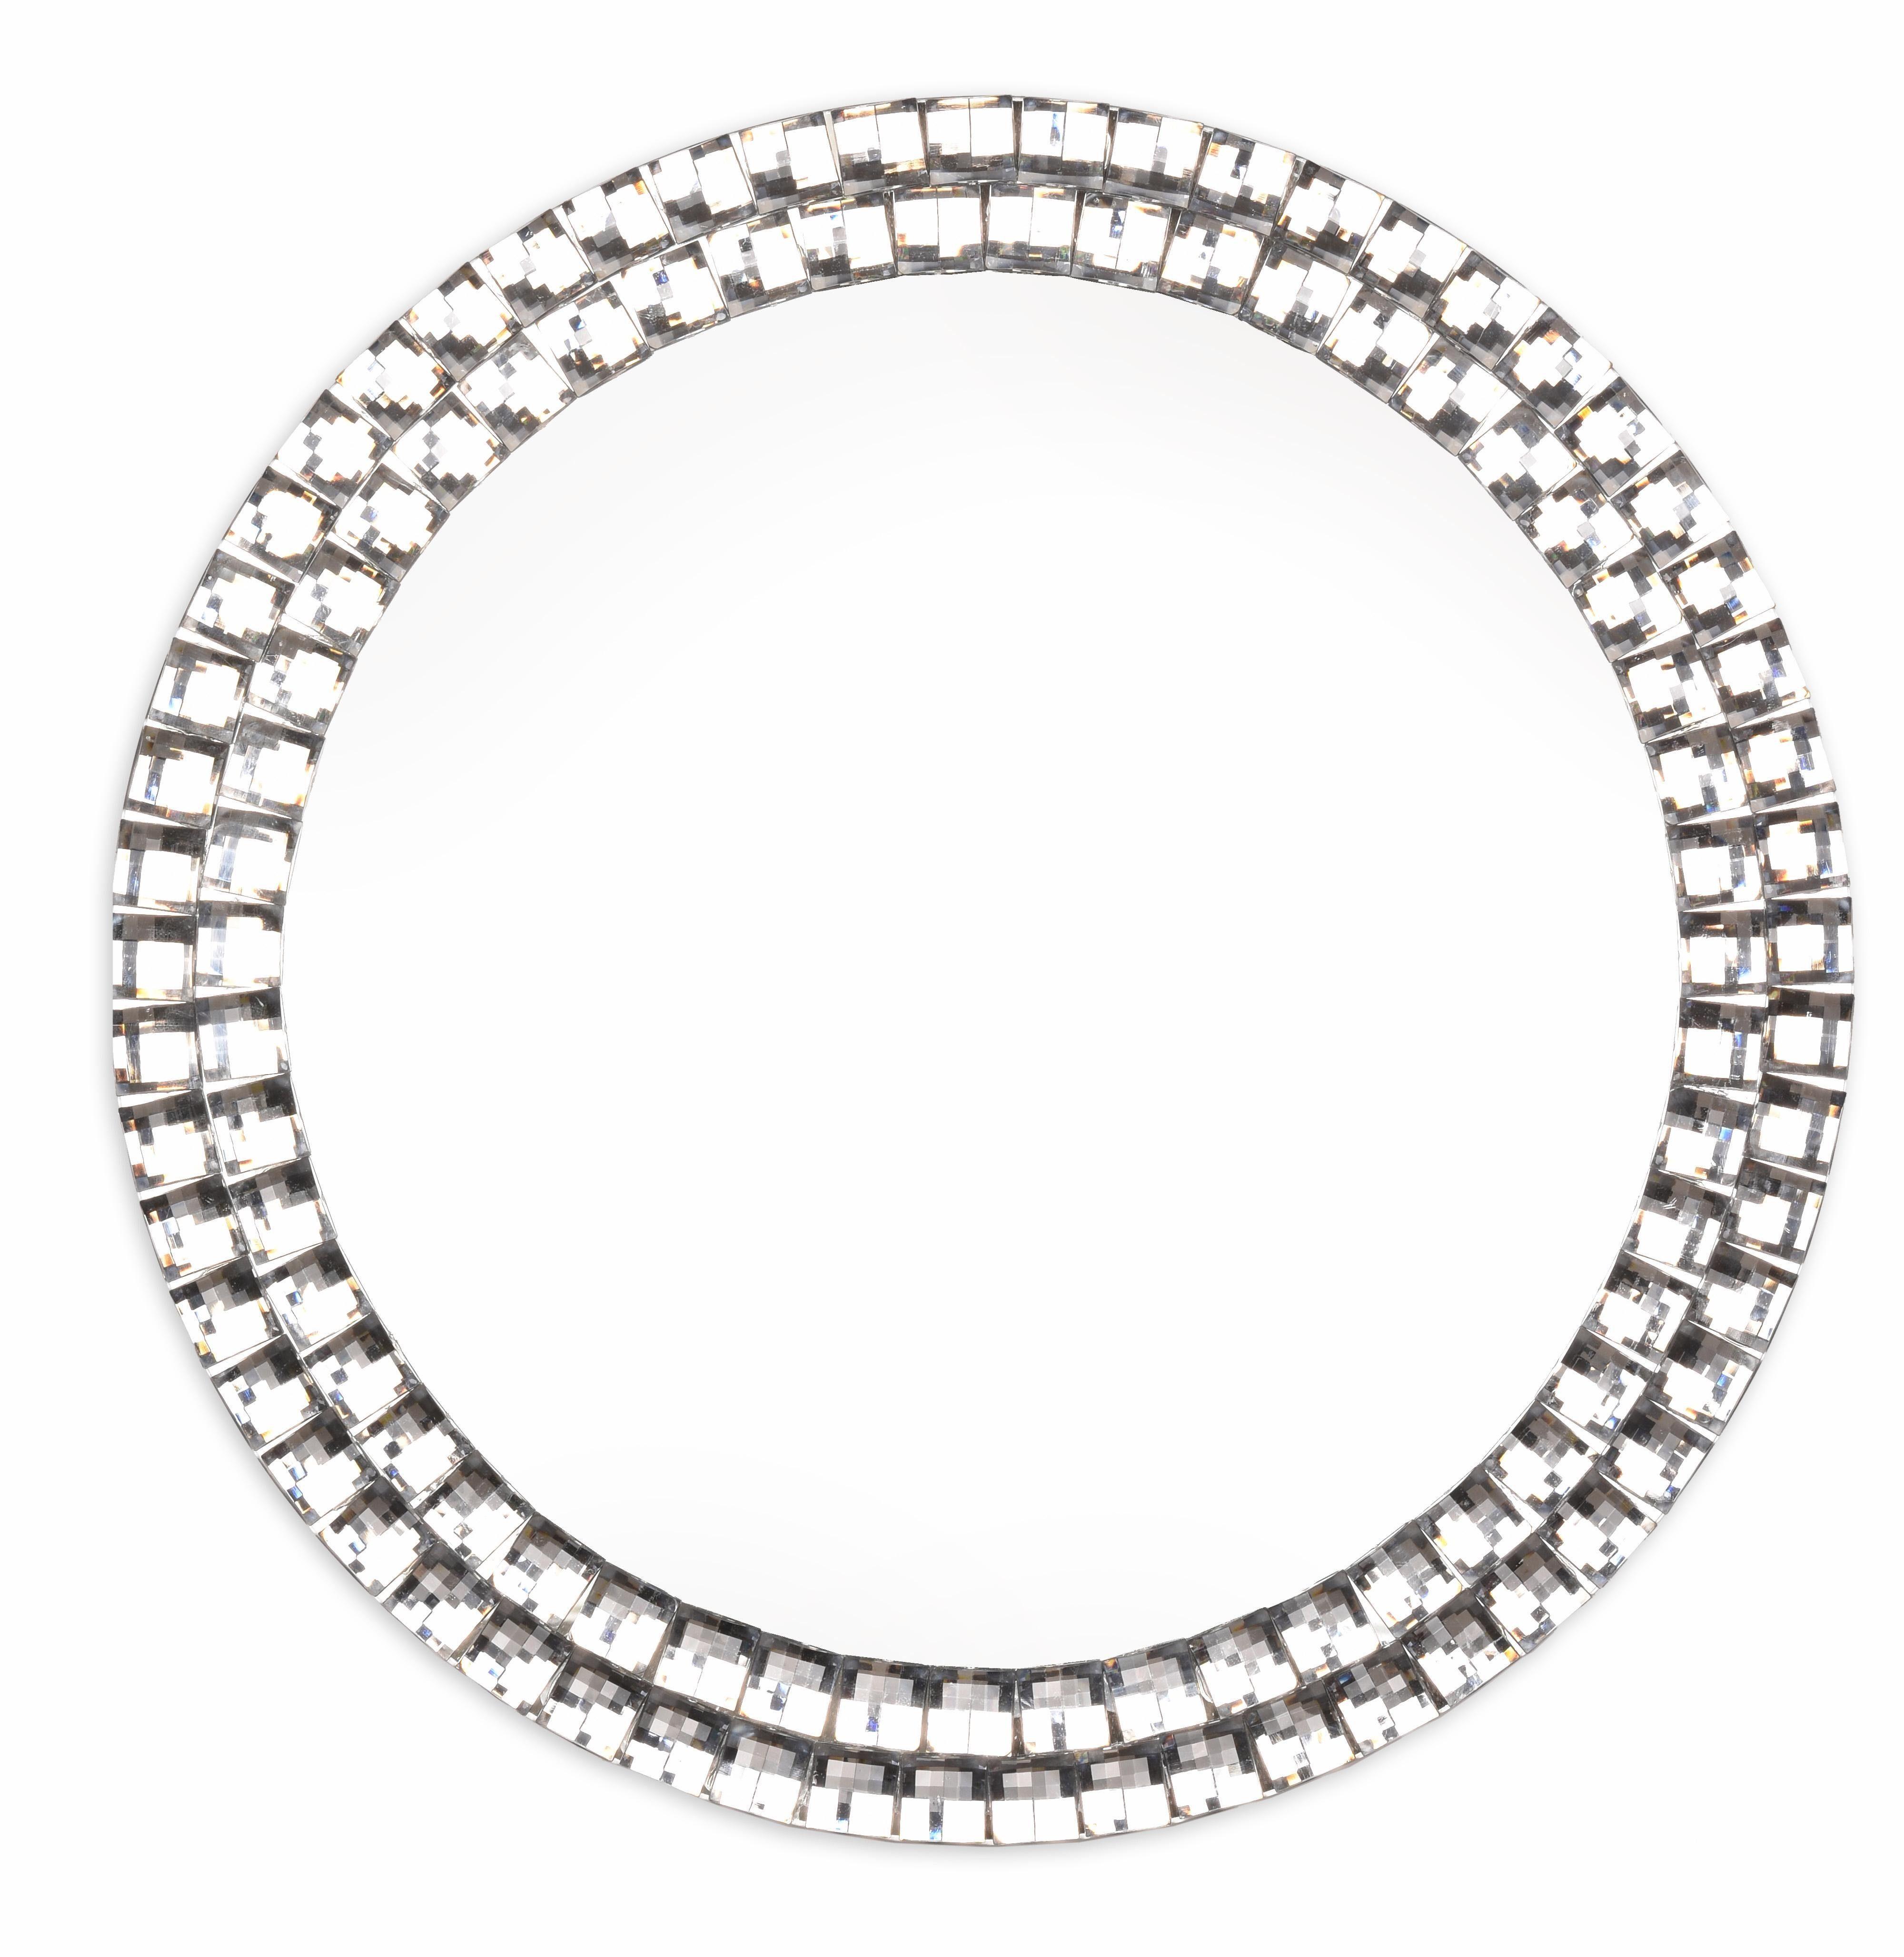 Home affaire, Spiegel »Jewelled Circular«, Ø 50 cm